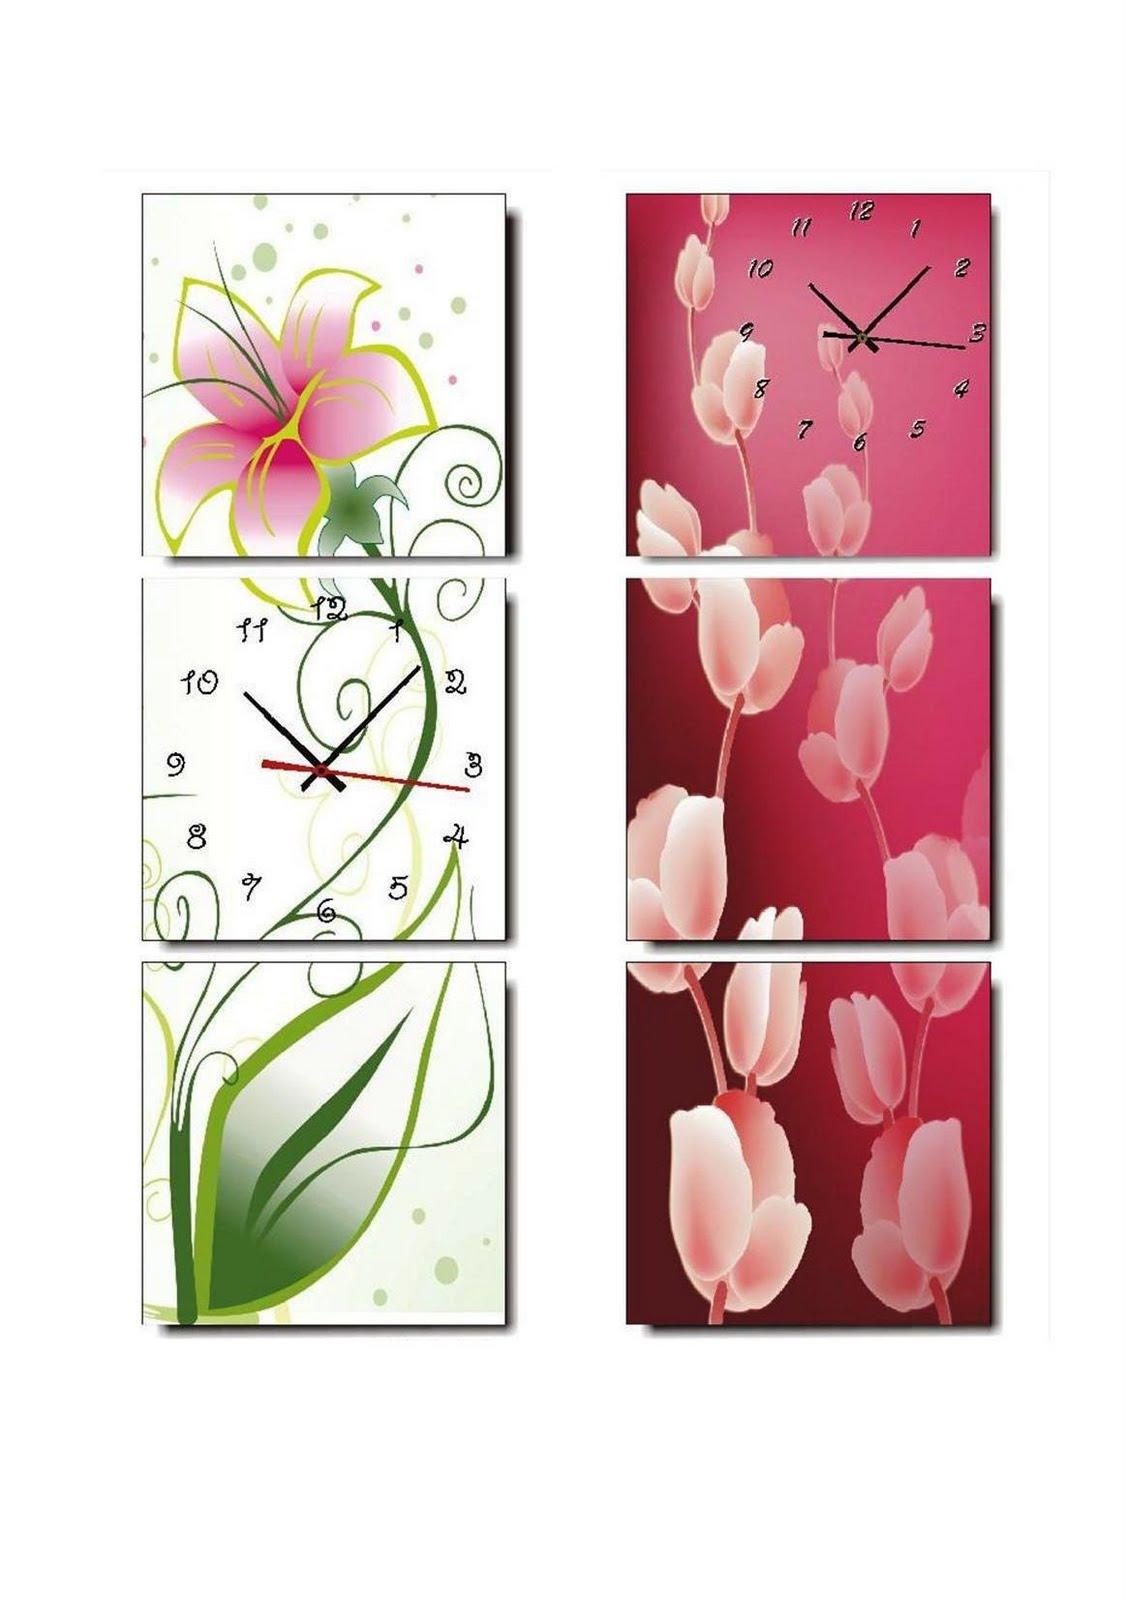 large wall clocks Vertical Panels Art Wall Clocks